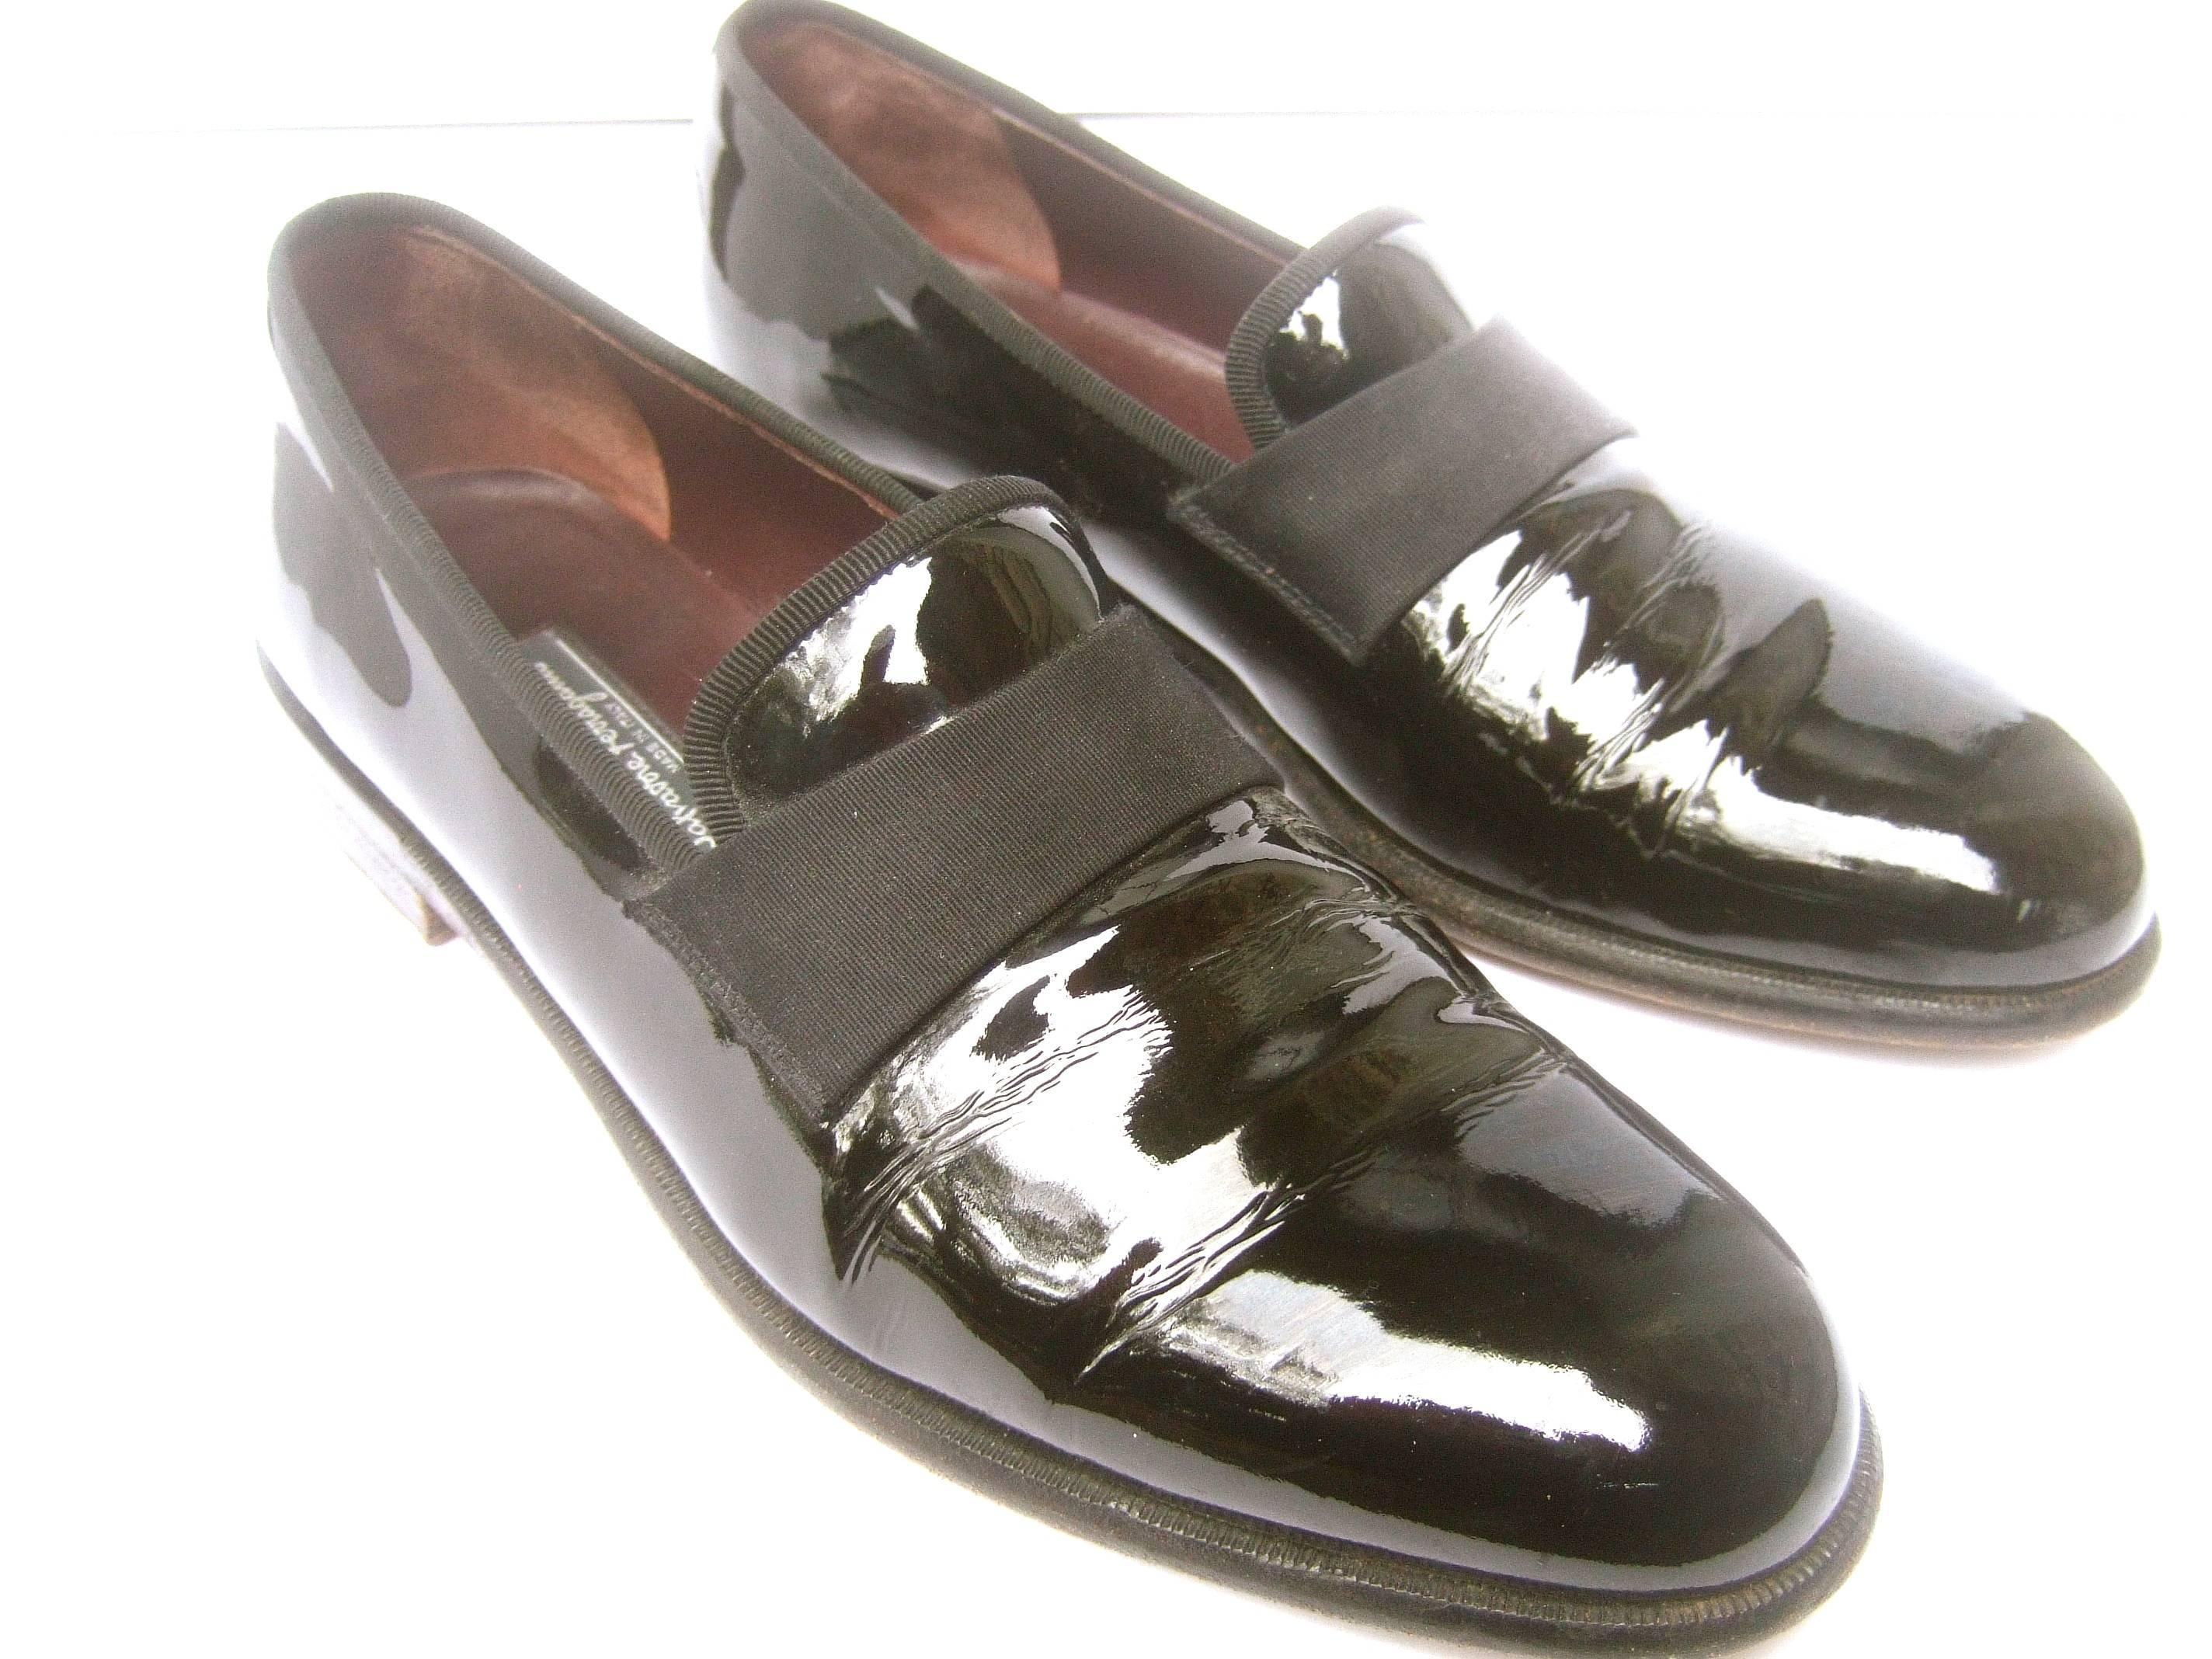 618738a46a392 Black Patent Leather Dress Shoes - raveitsafe